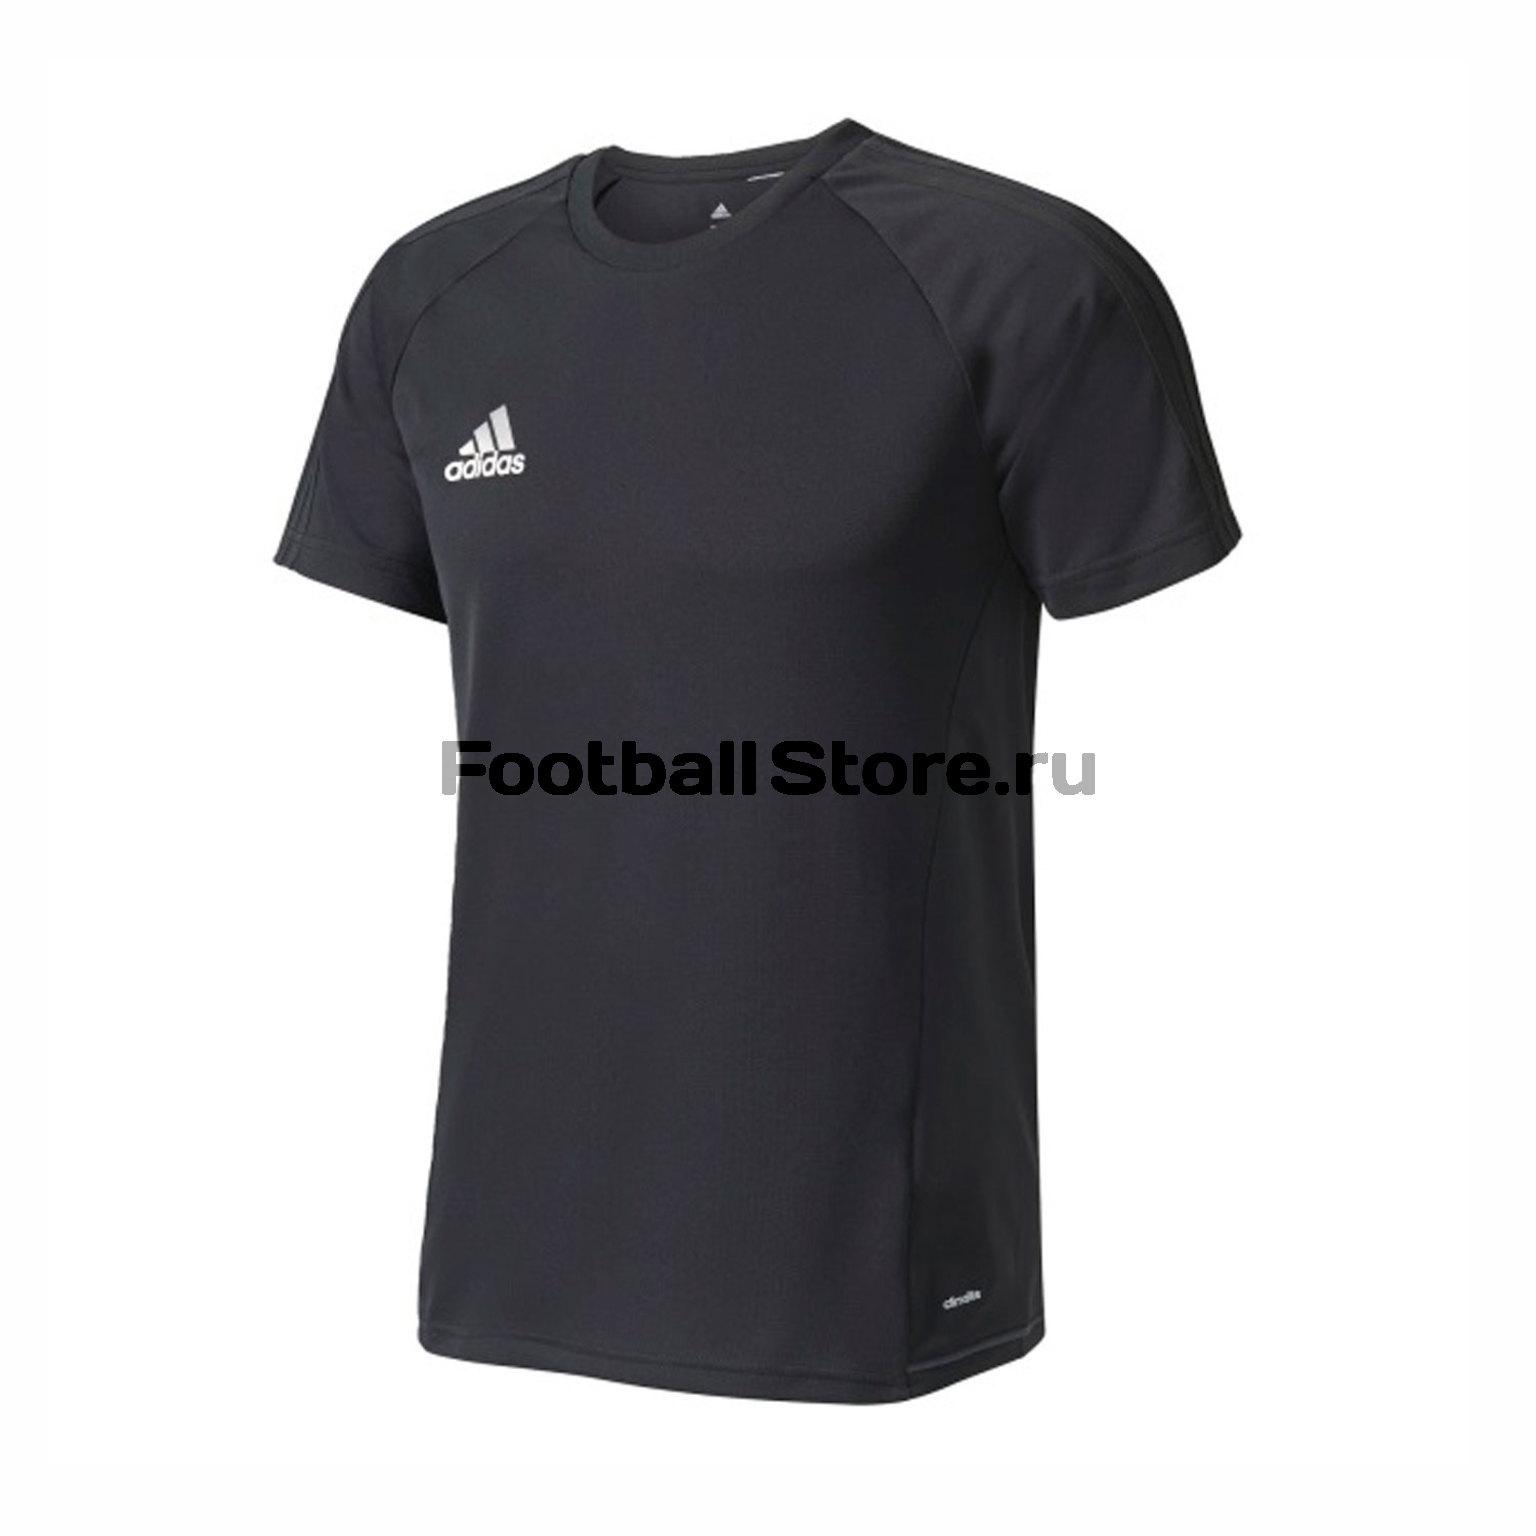 Футболки Adidas Футболка Adidas Tiro 17 CL JSY S98383